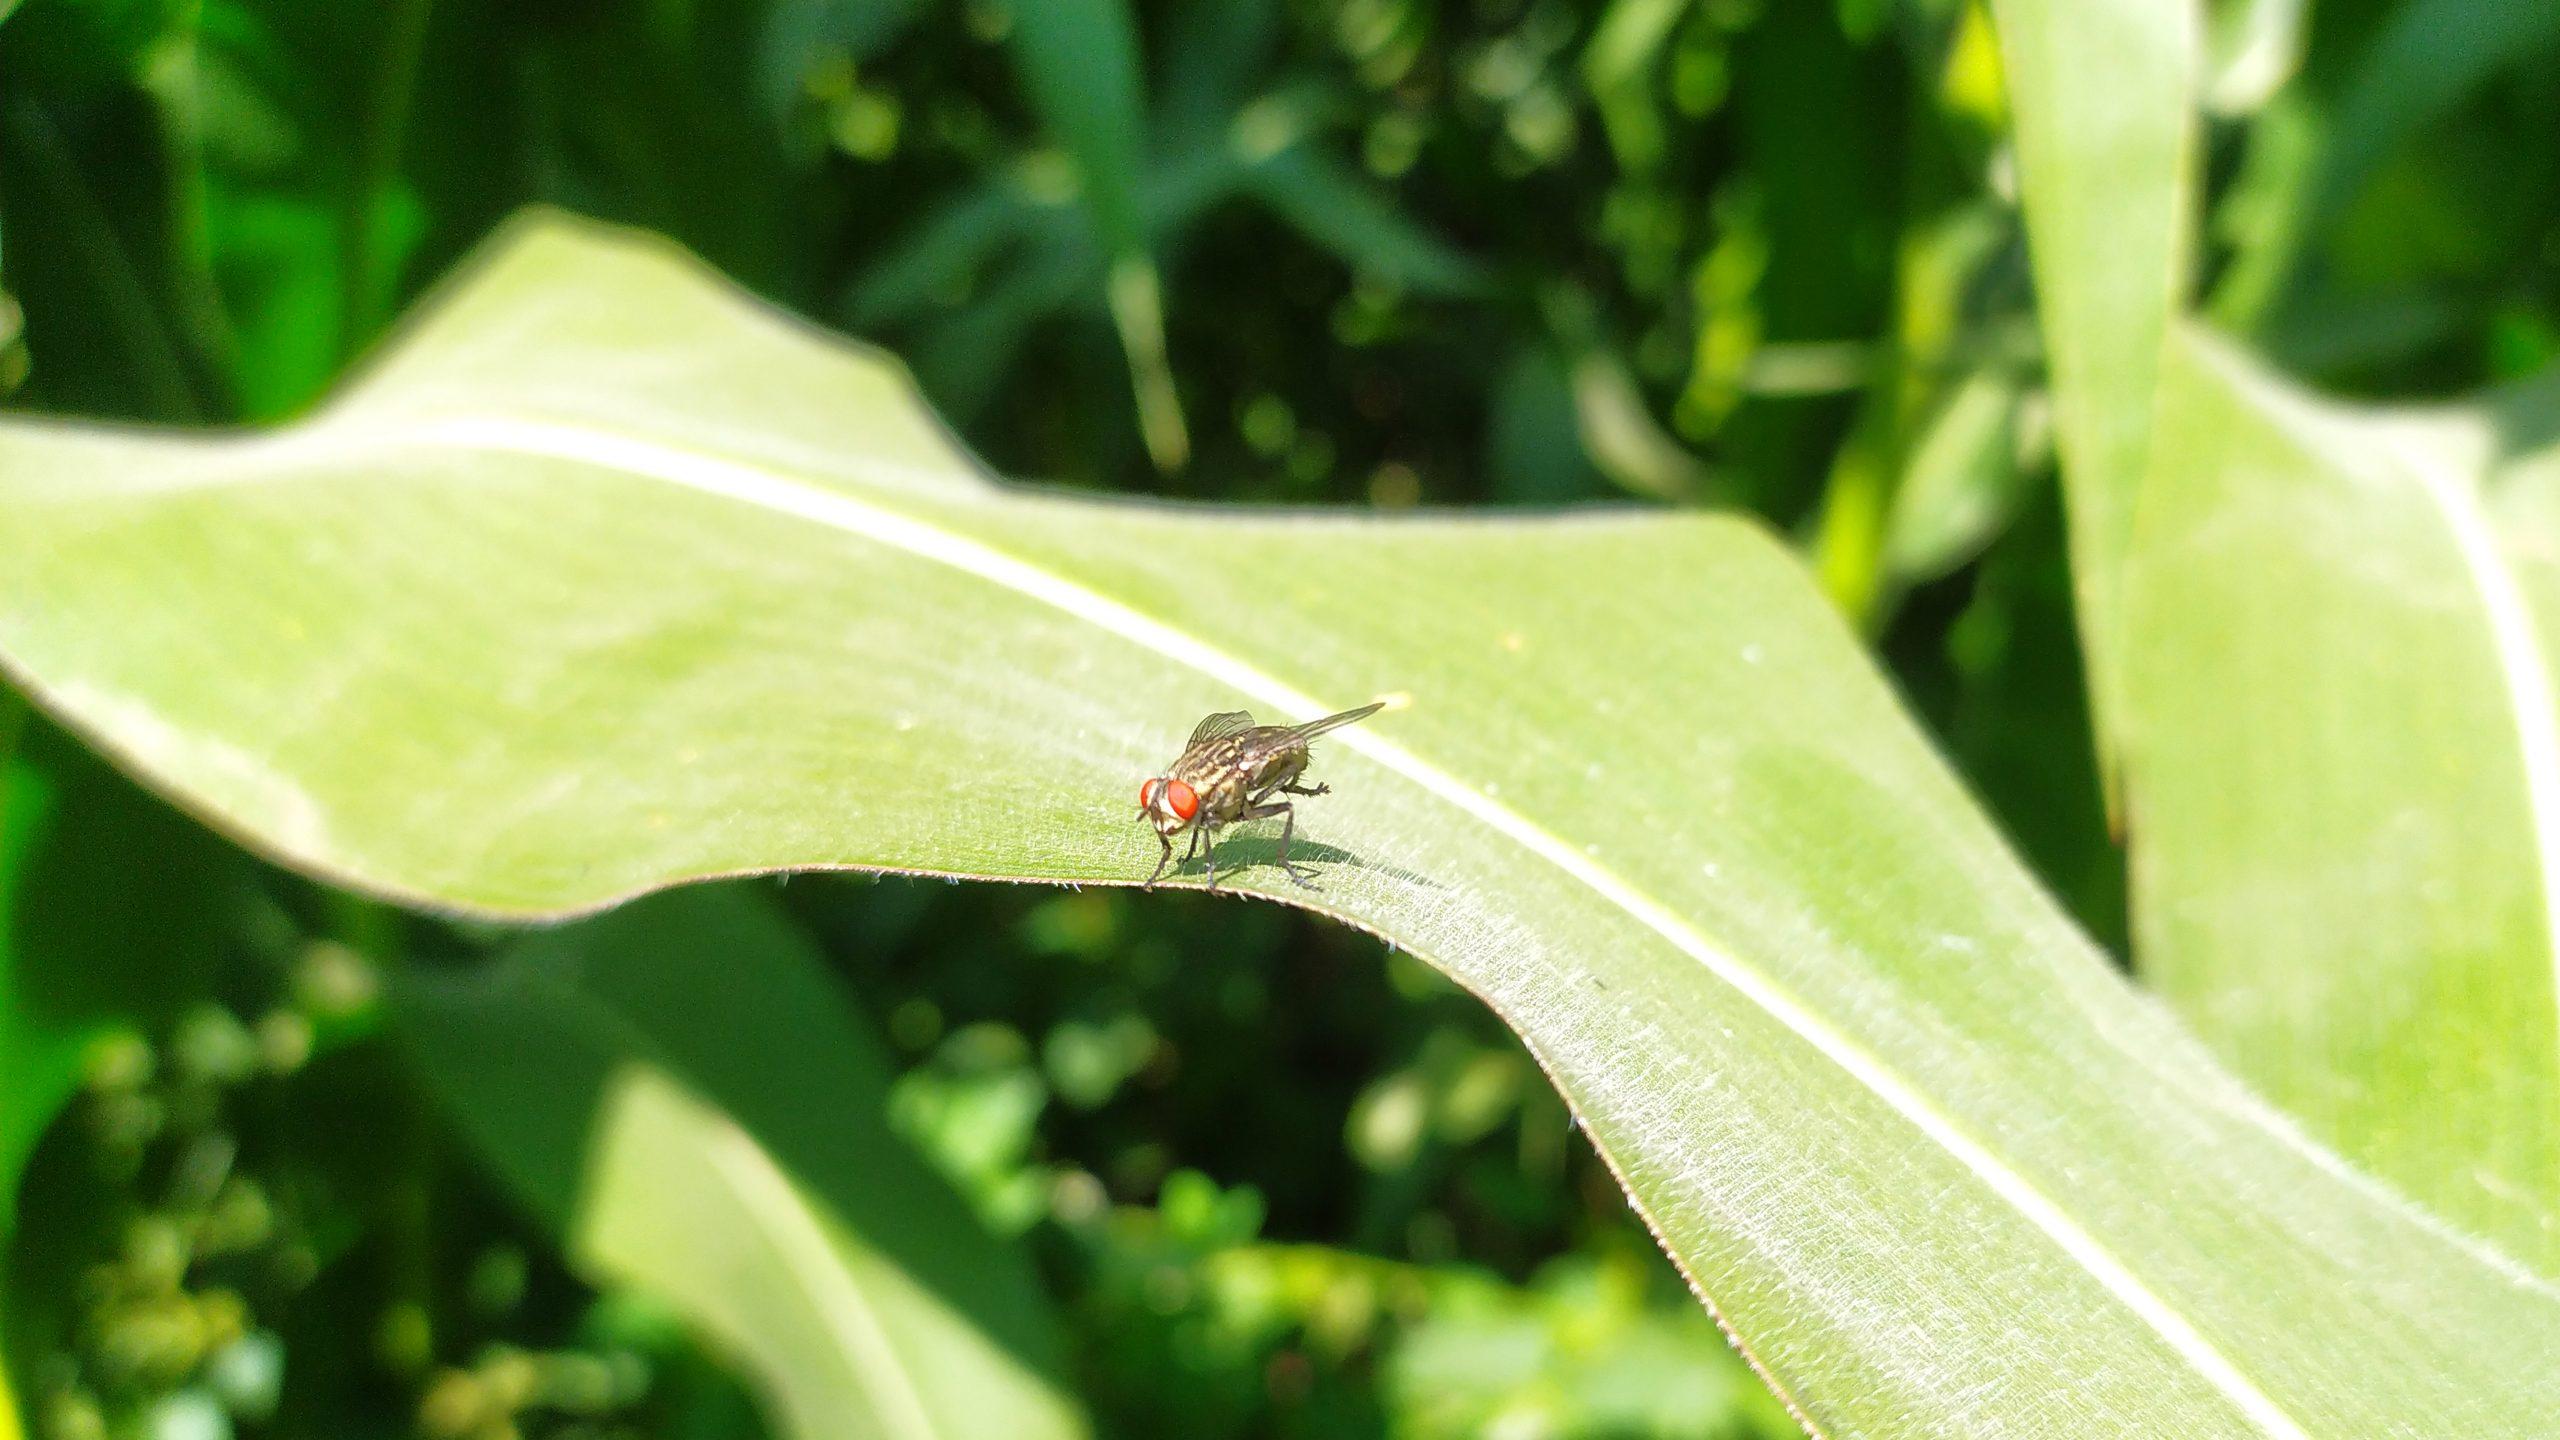 Housefly on plant leaf